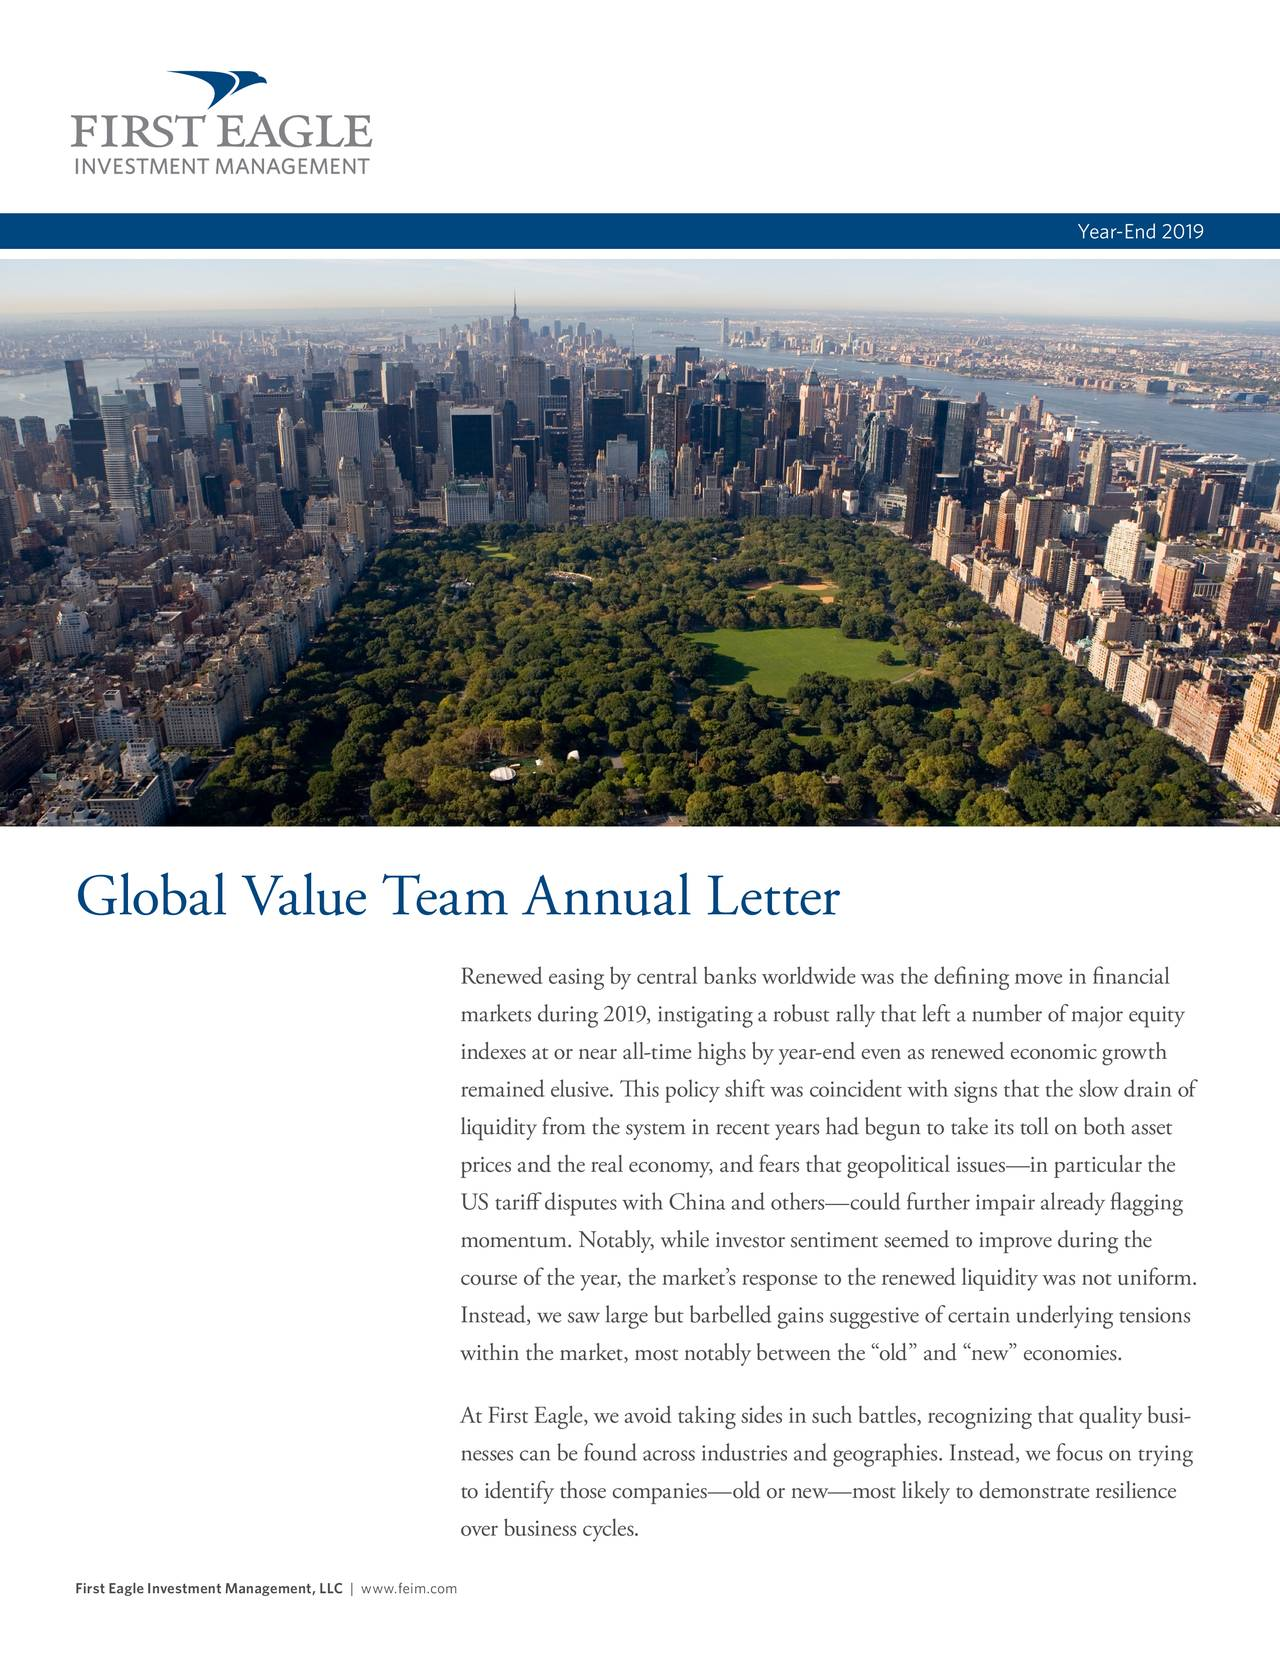 First Eagle Global Value Team Annual Letter 2019 | Seeking Alpha